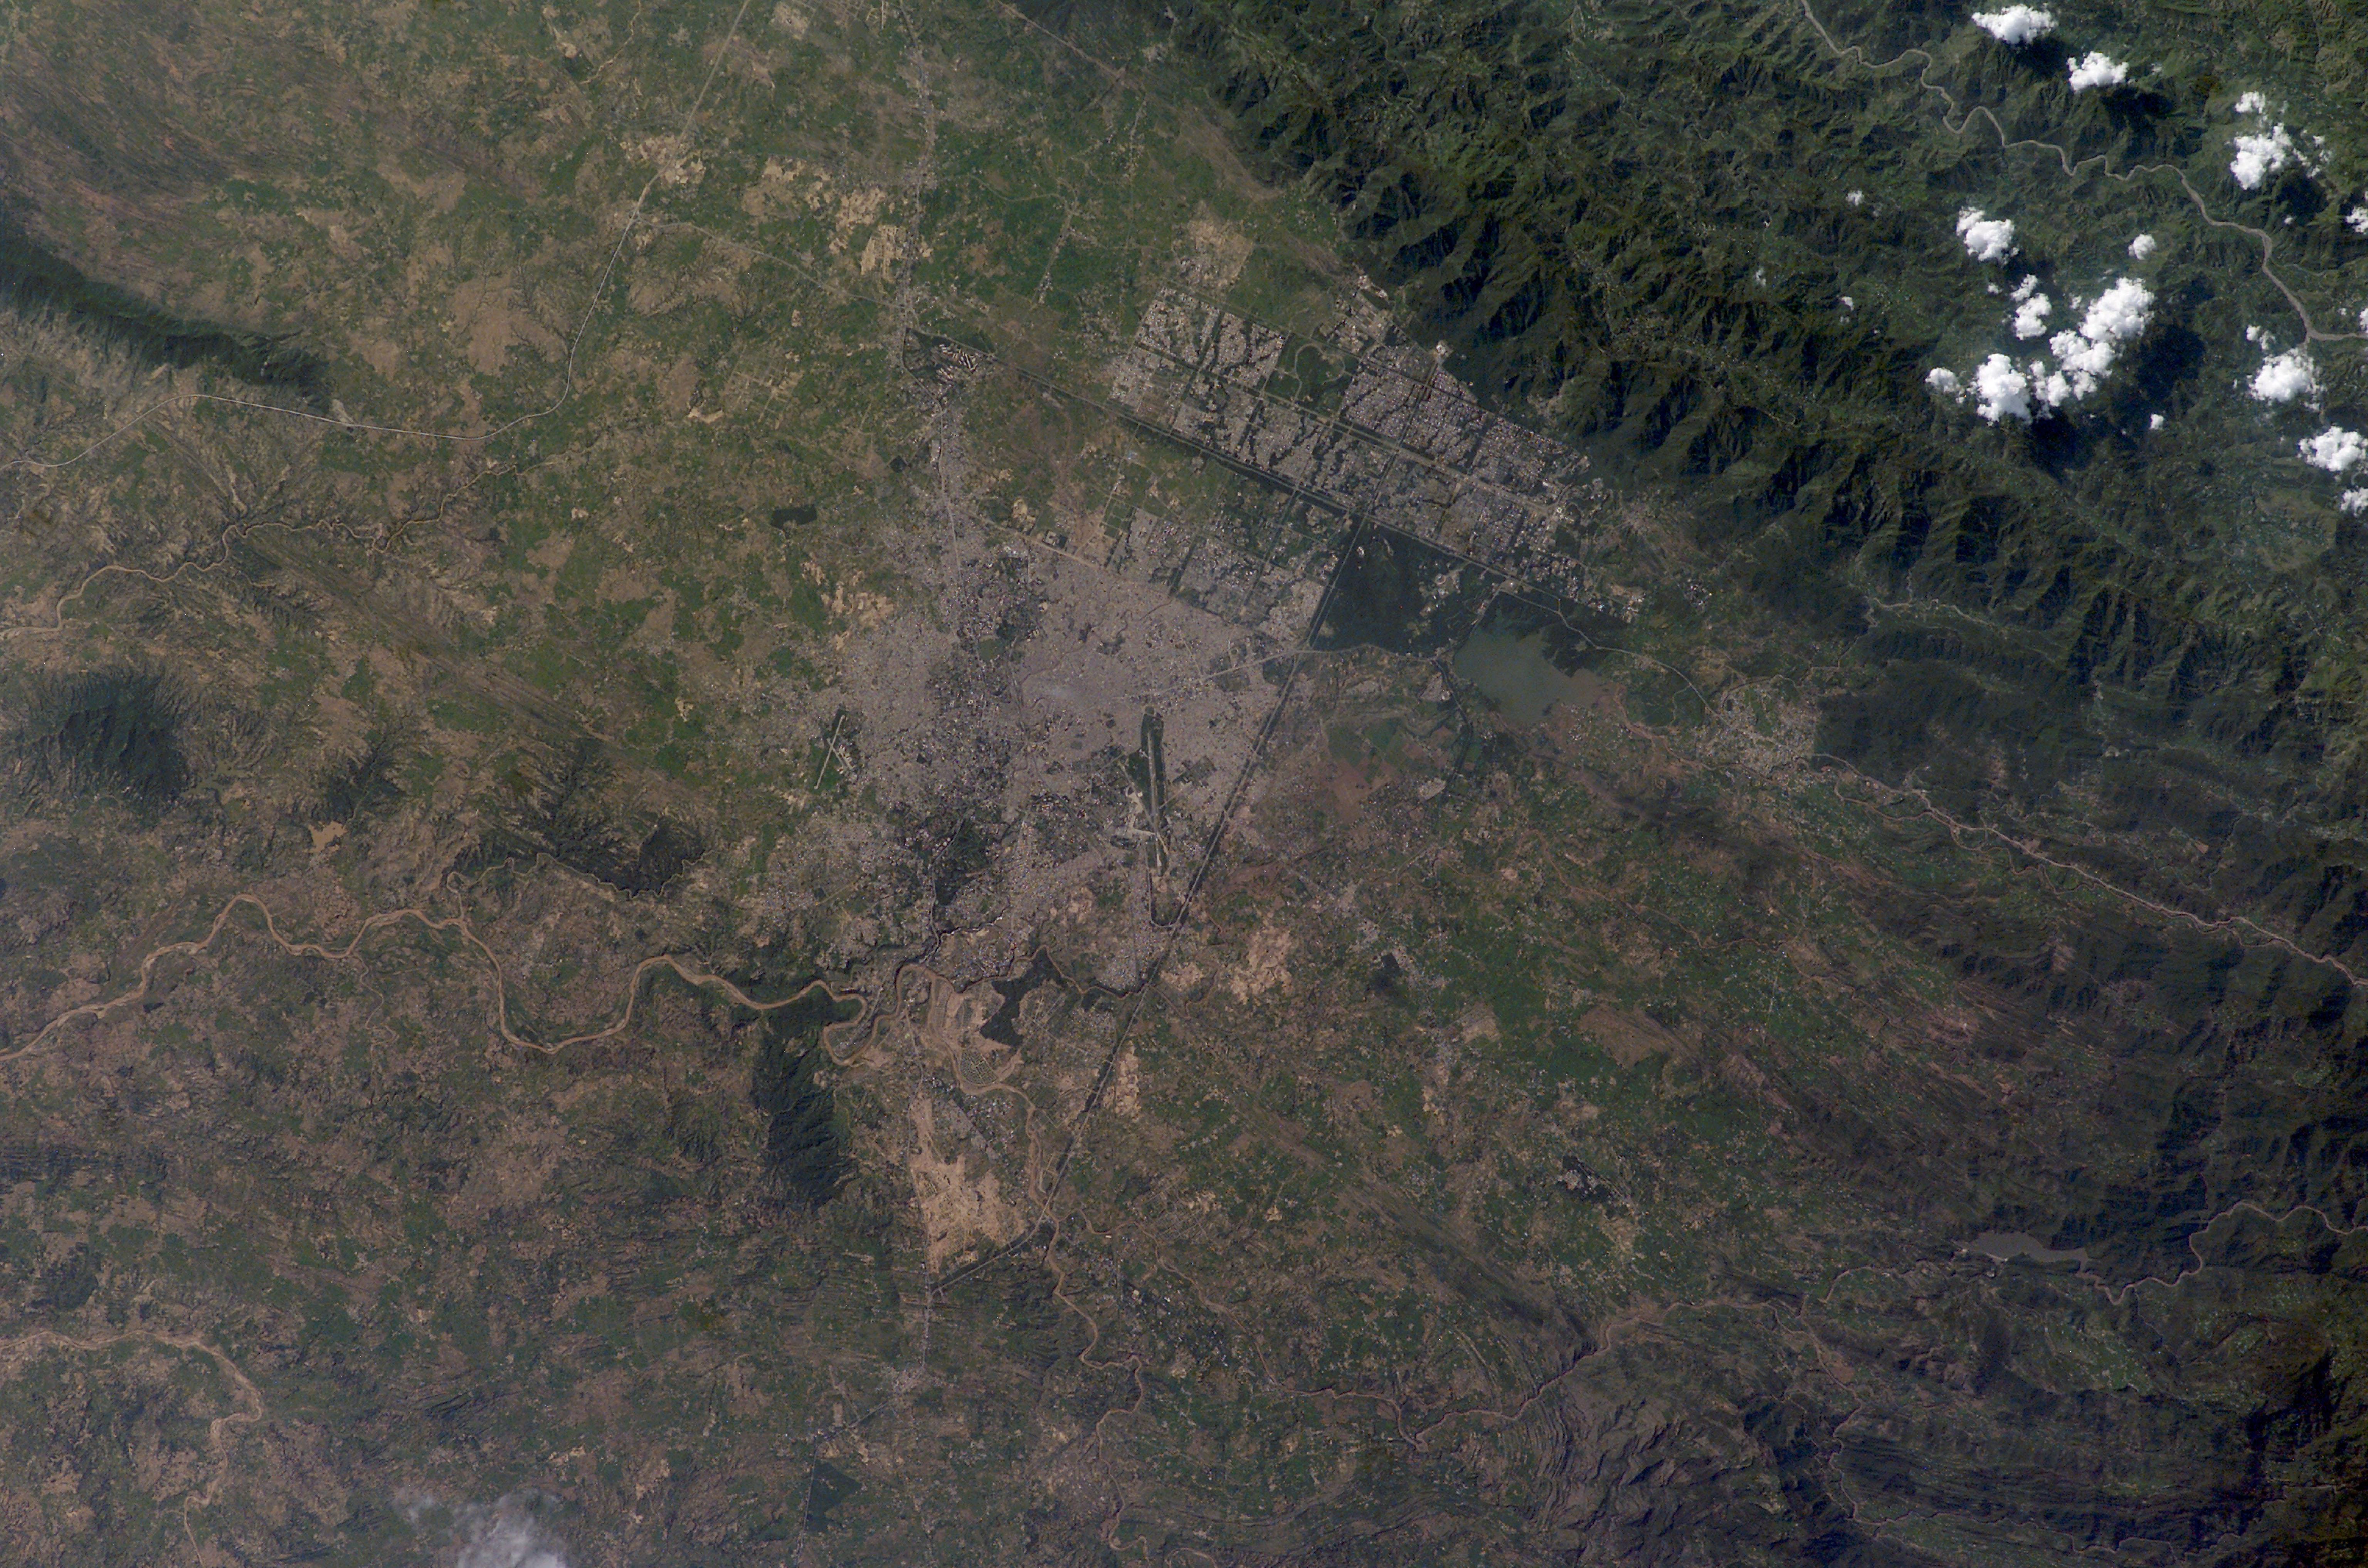 Islamabad and Rawalpindi, Pakistan - related image preview